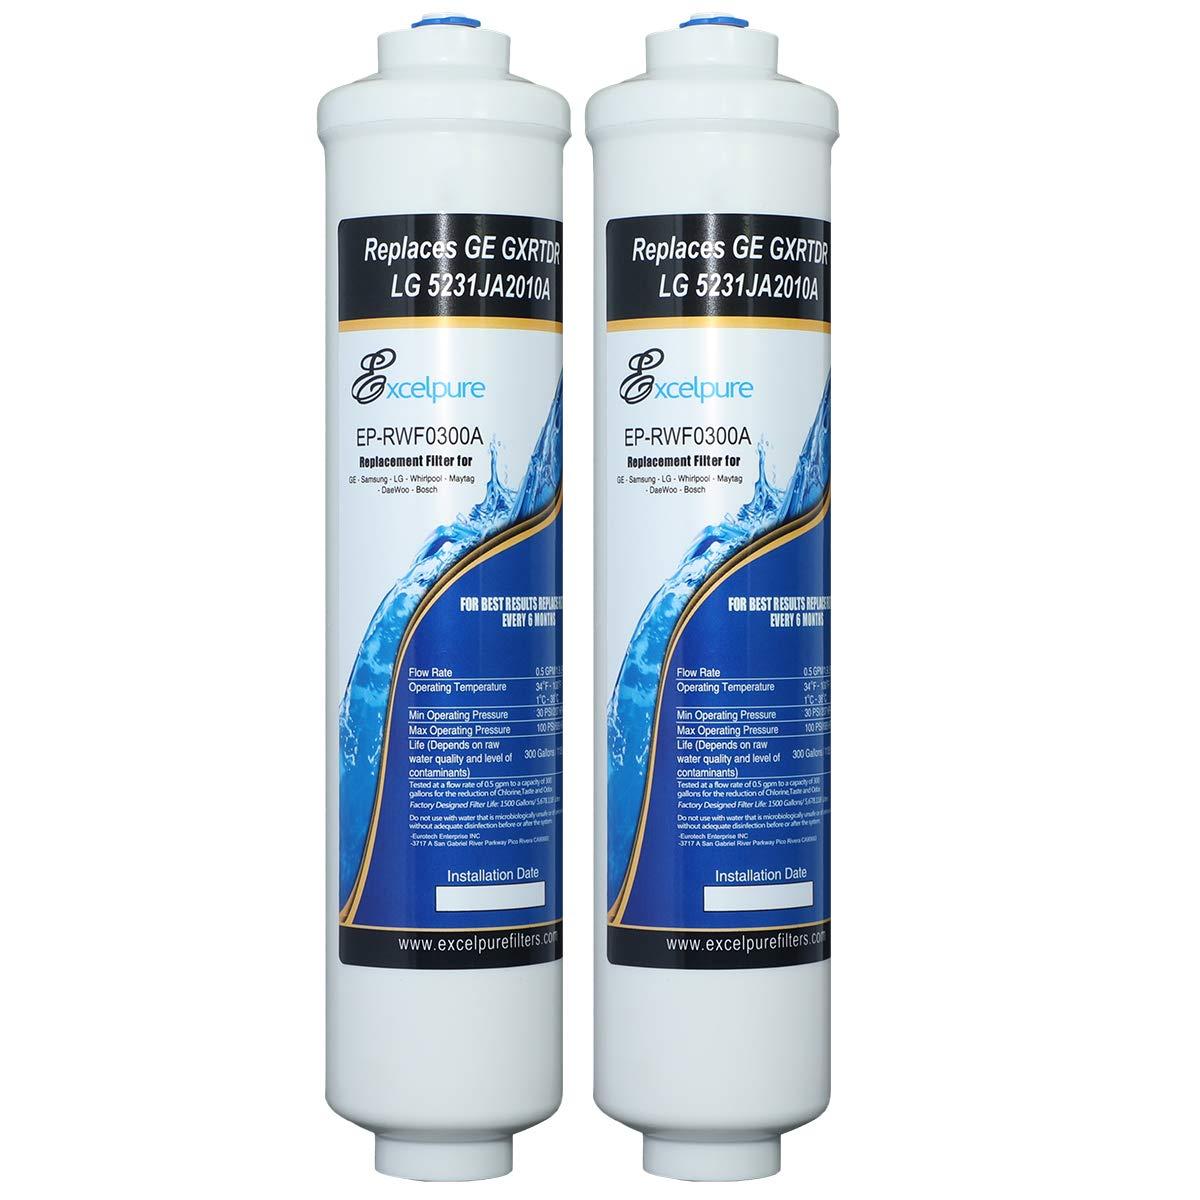 EXCELPURE Inline Water Filter Compatible With GE GXRTDR, GXRTPR, GXRTDQ, Culligan IC-100A,Samsung HAFEX/EXP, DA29-10105J, 4378411RB, Brita WFRF-104, For Refrigerator, IceMaker, RVs, Marines - 2PACK